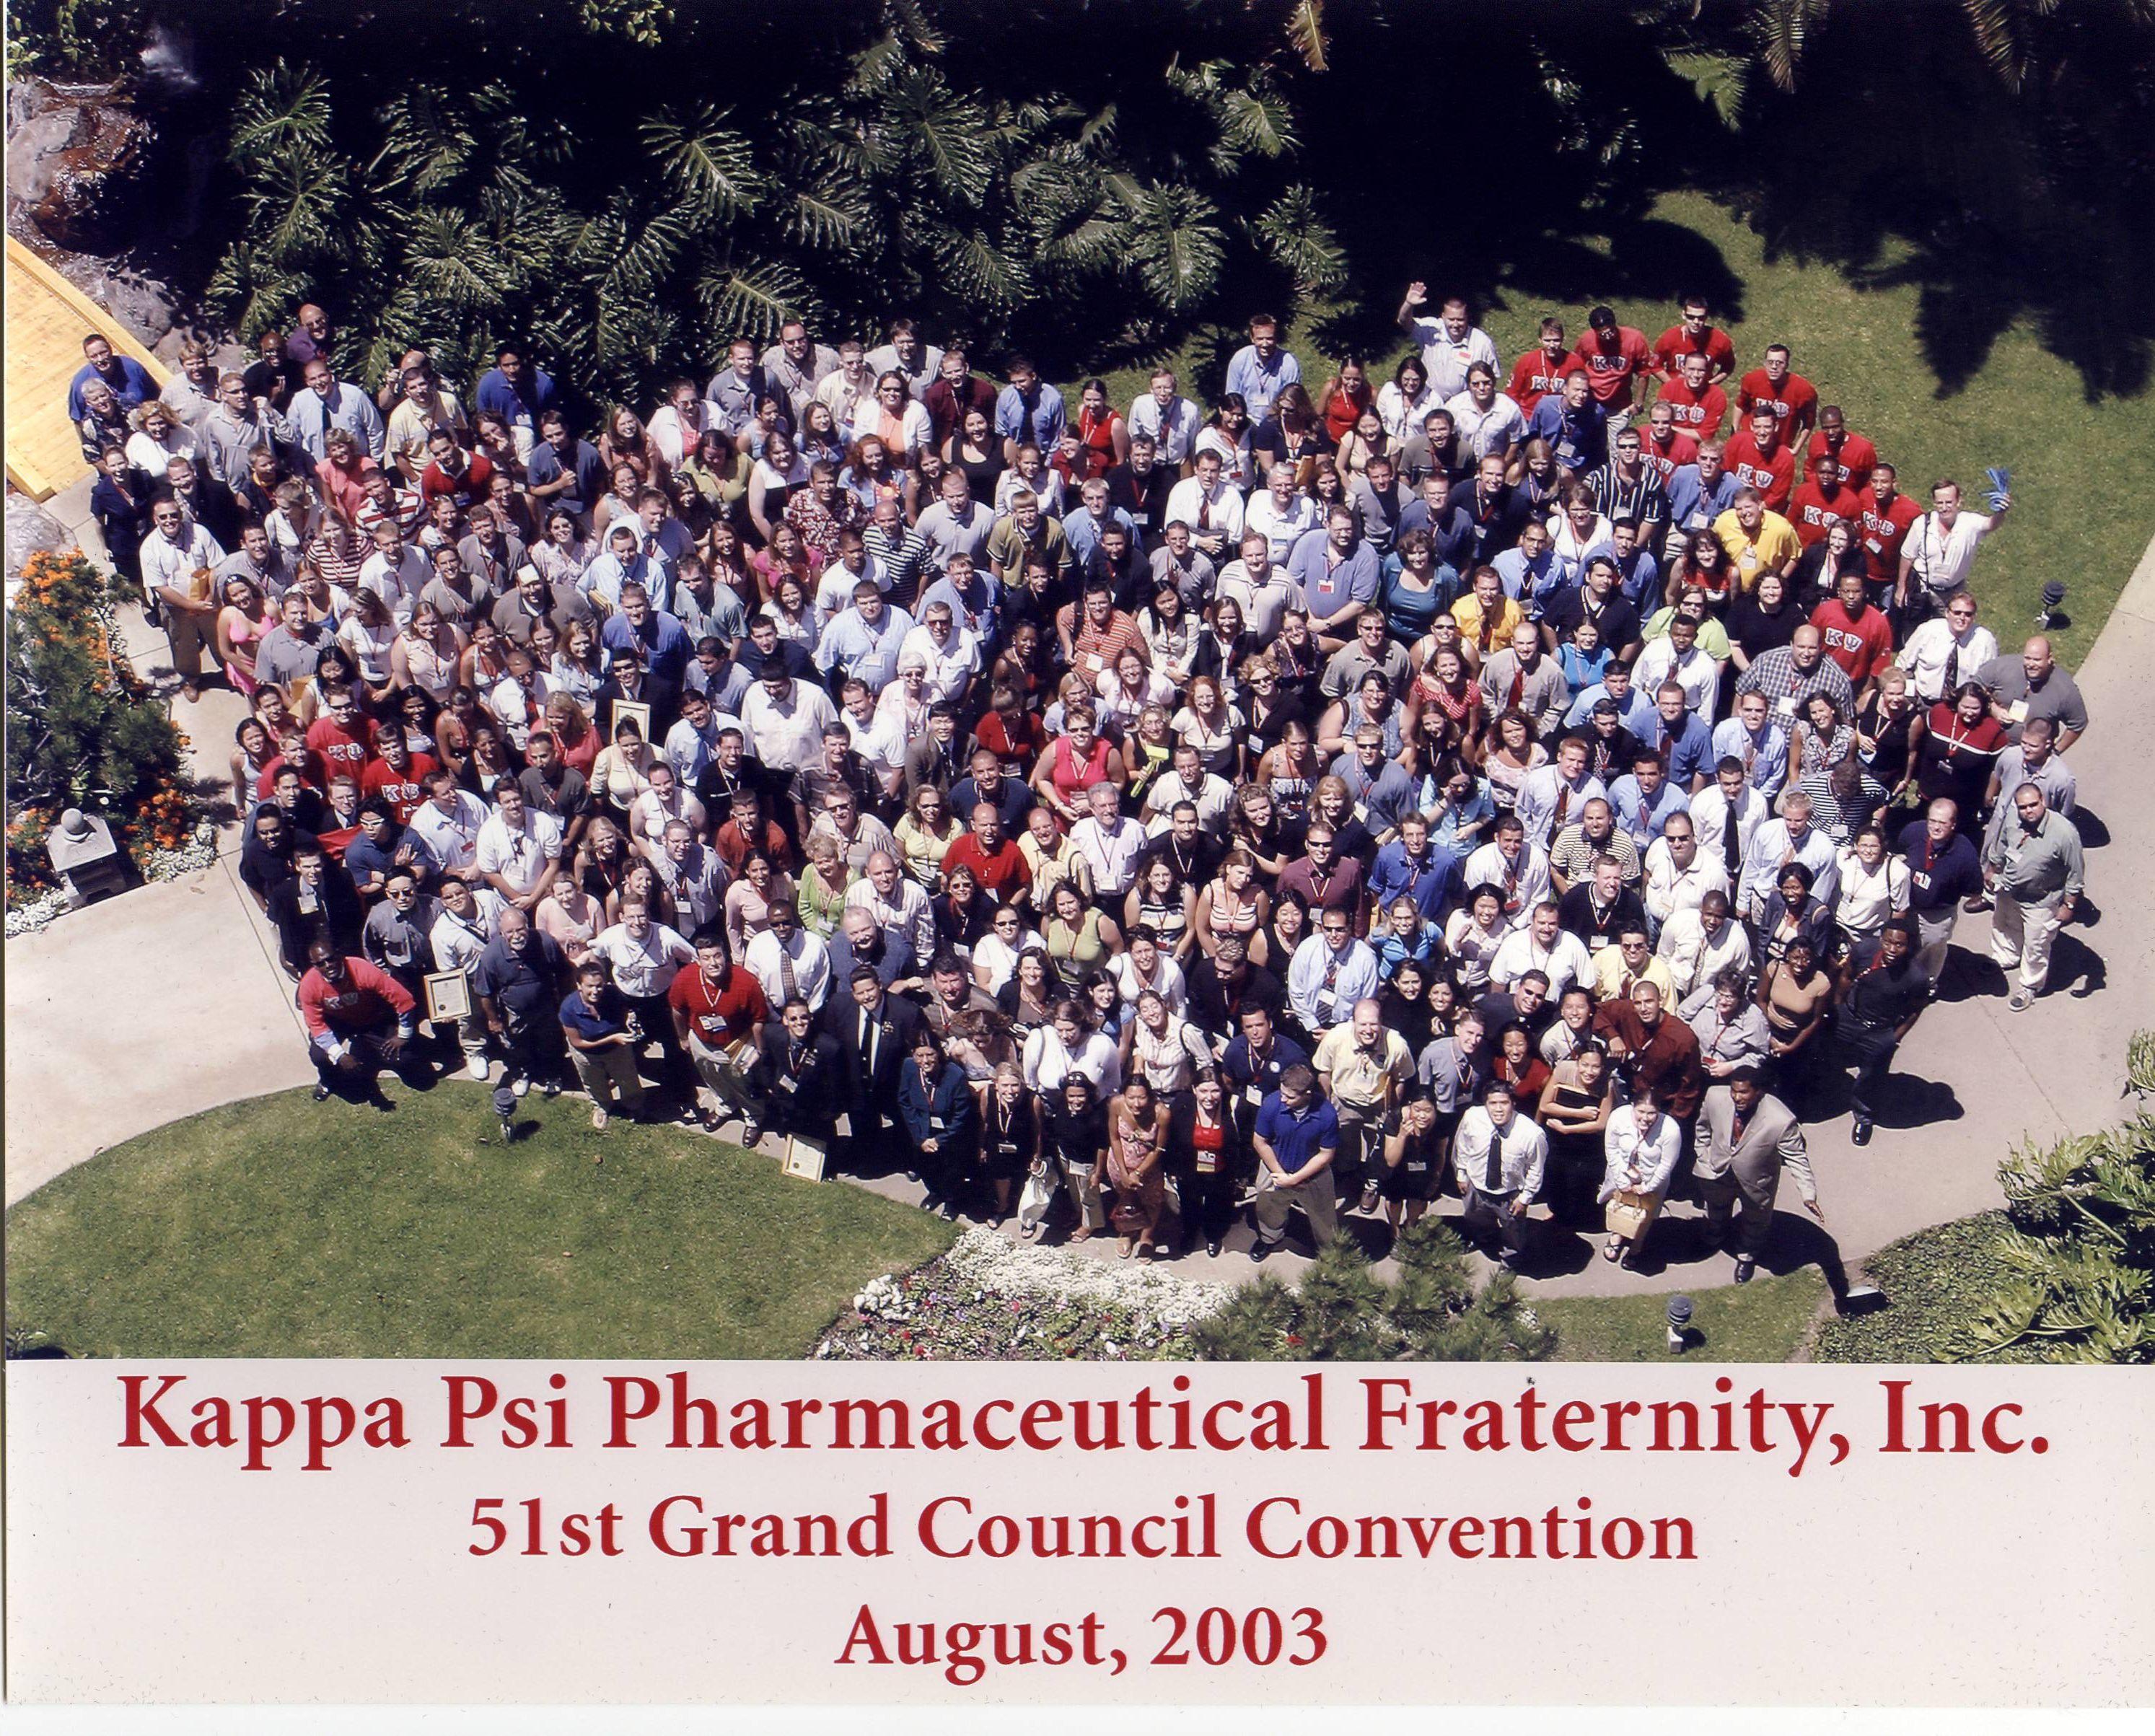 Kappa Psi Pharmaceutical Fraternity b6c2c80363844